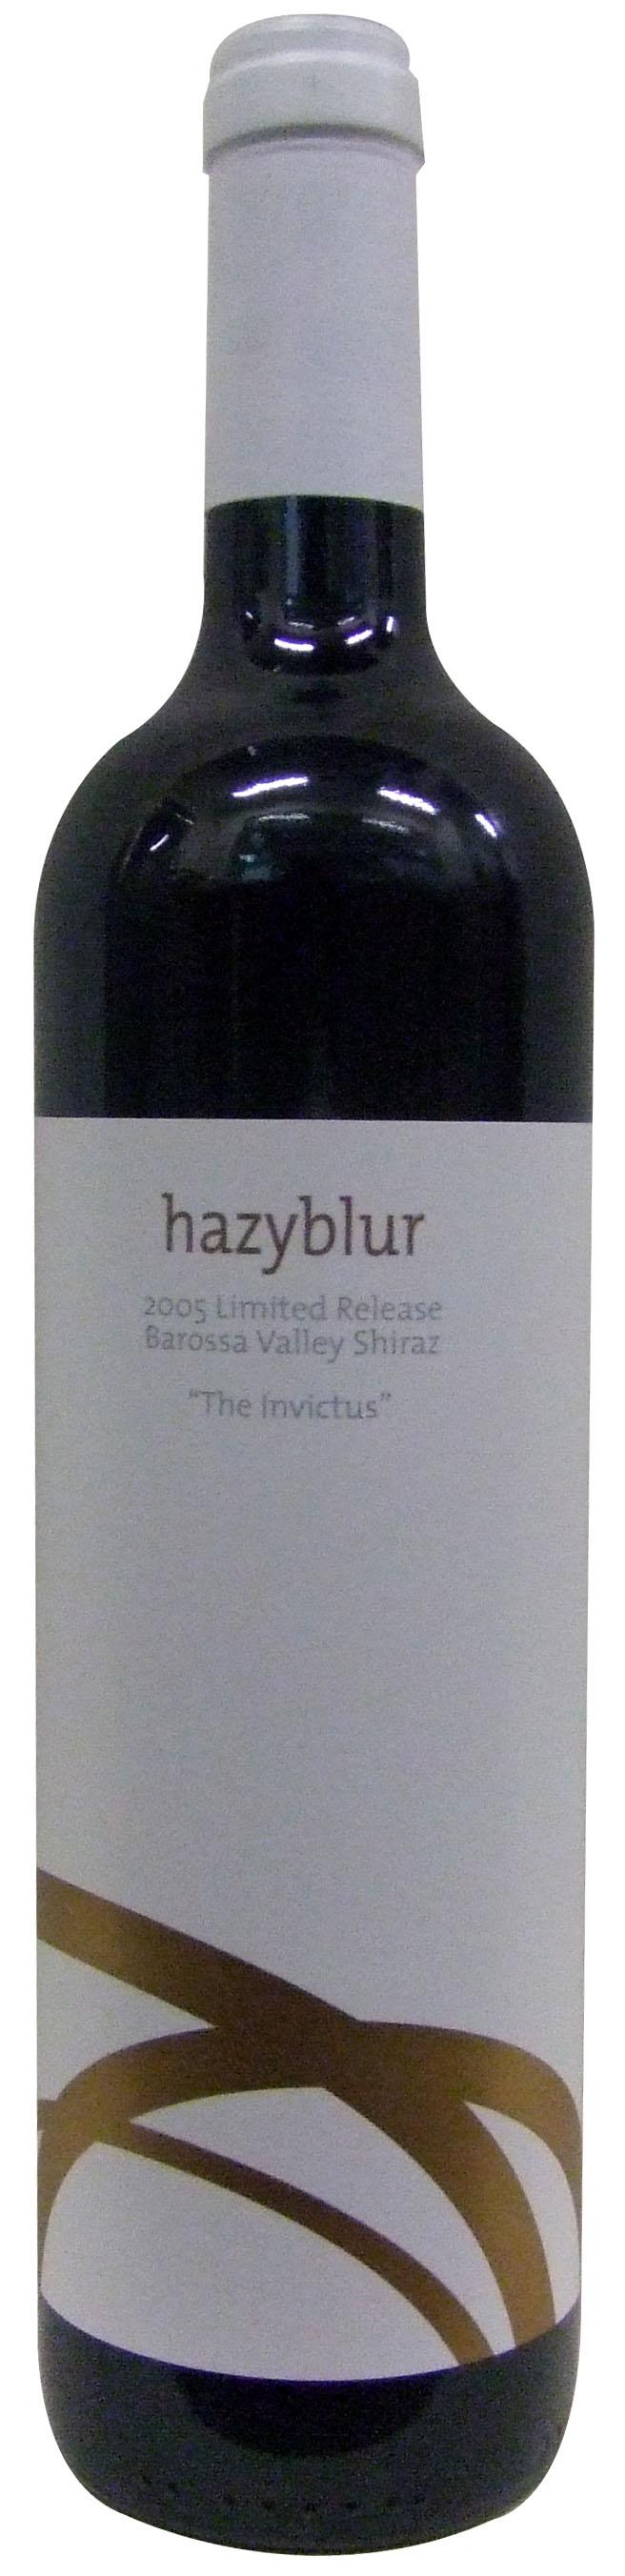 Hazyblur The Invictus barossa valley shiraze 2005.jpg